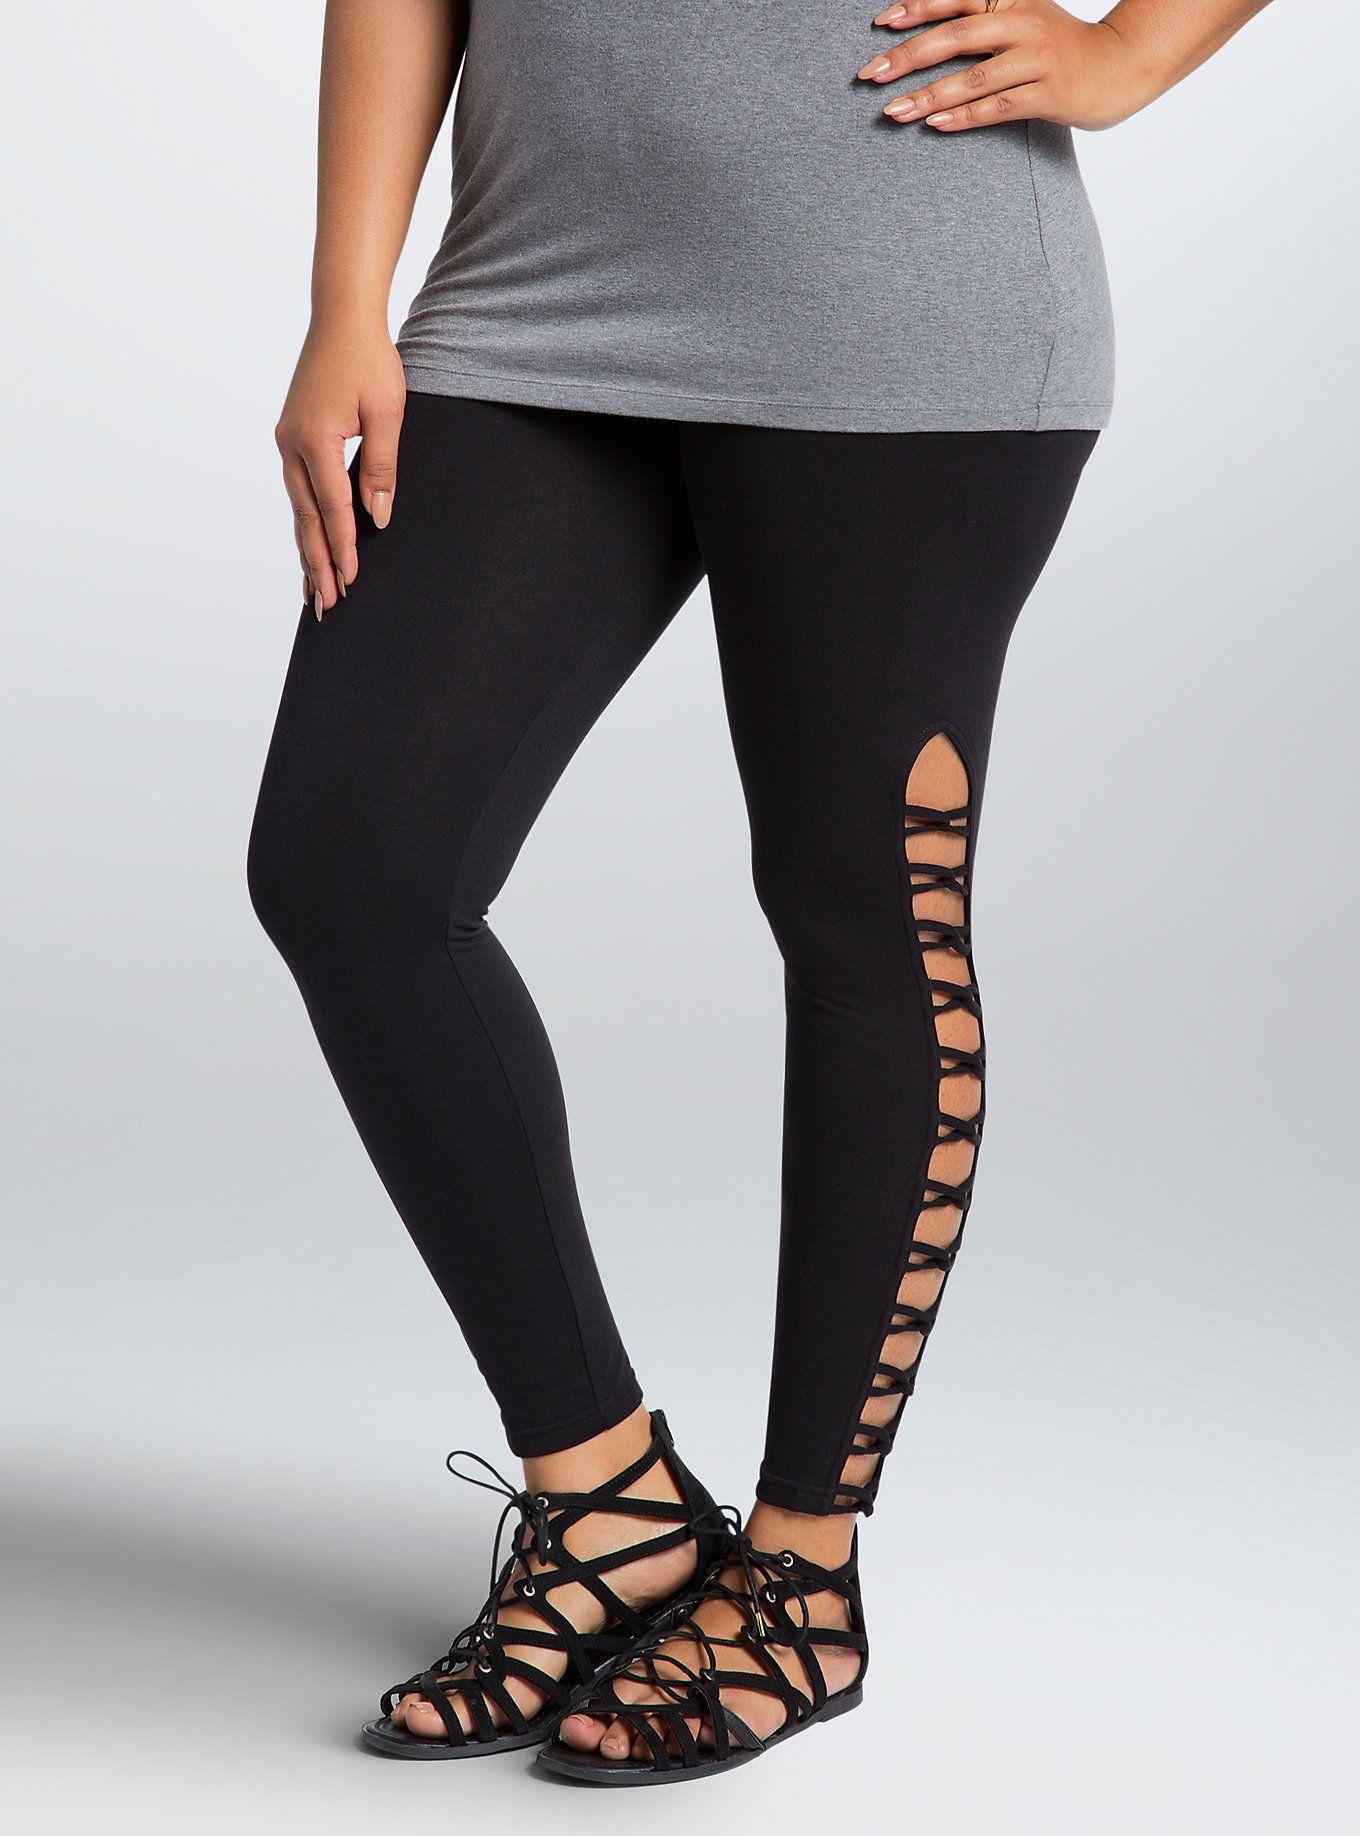 5766c2ed3b Side Lattice Leggings in 2019 | style | Leggings, Plus size legging ...